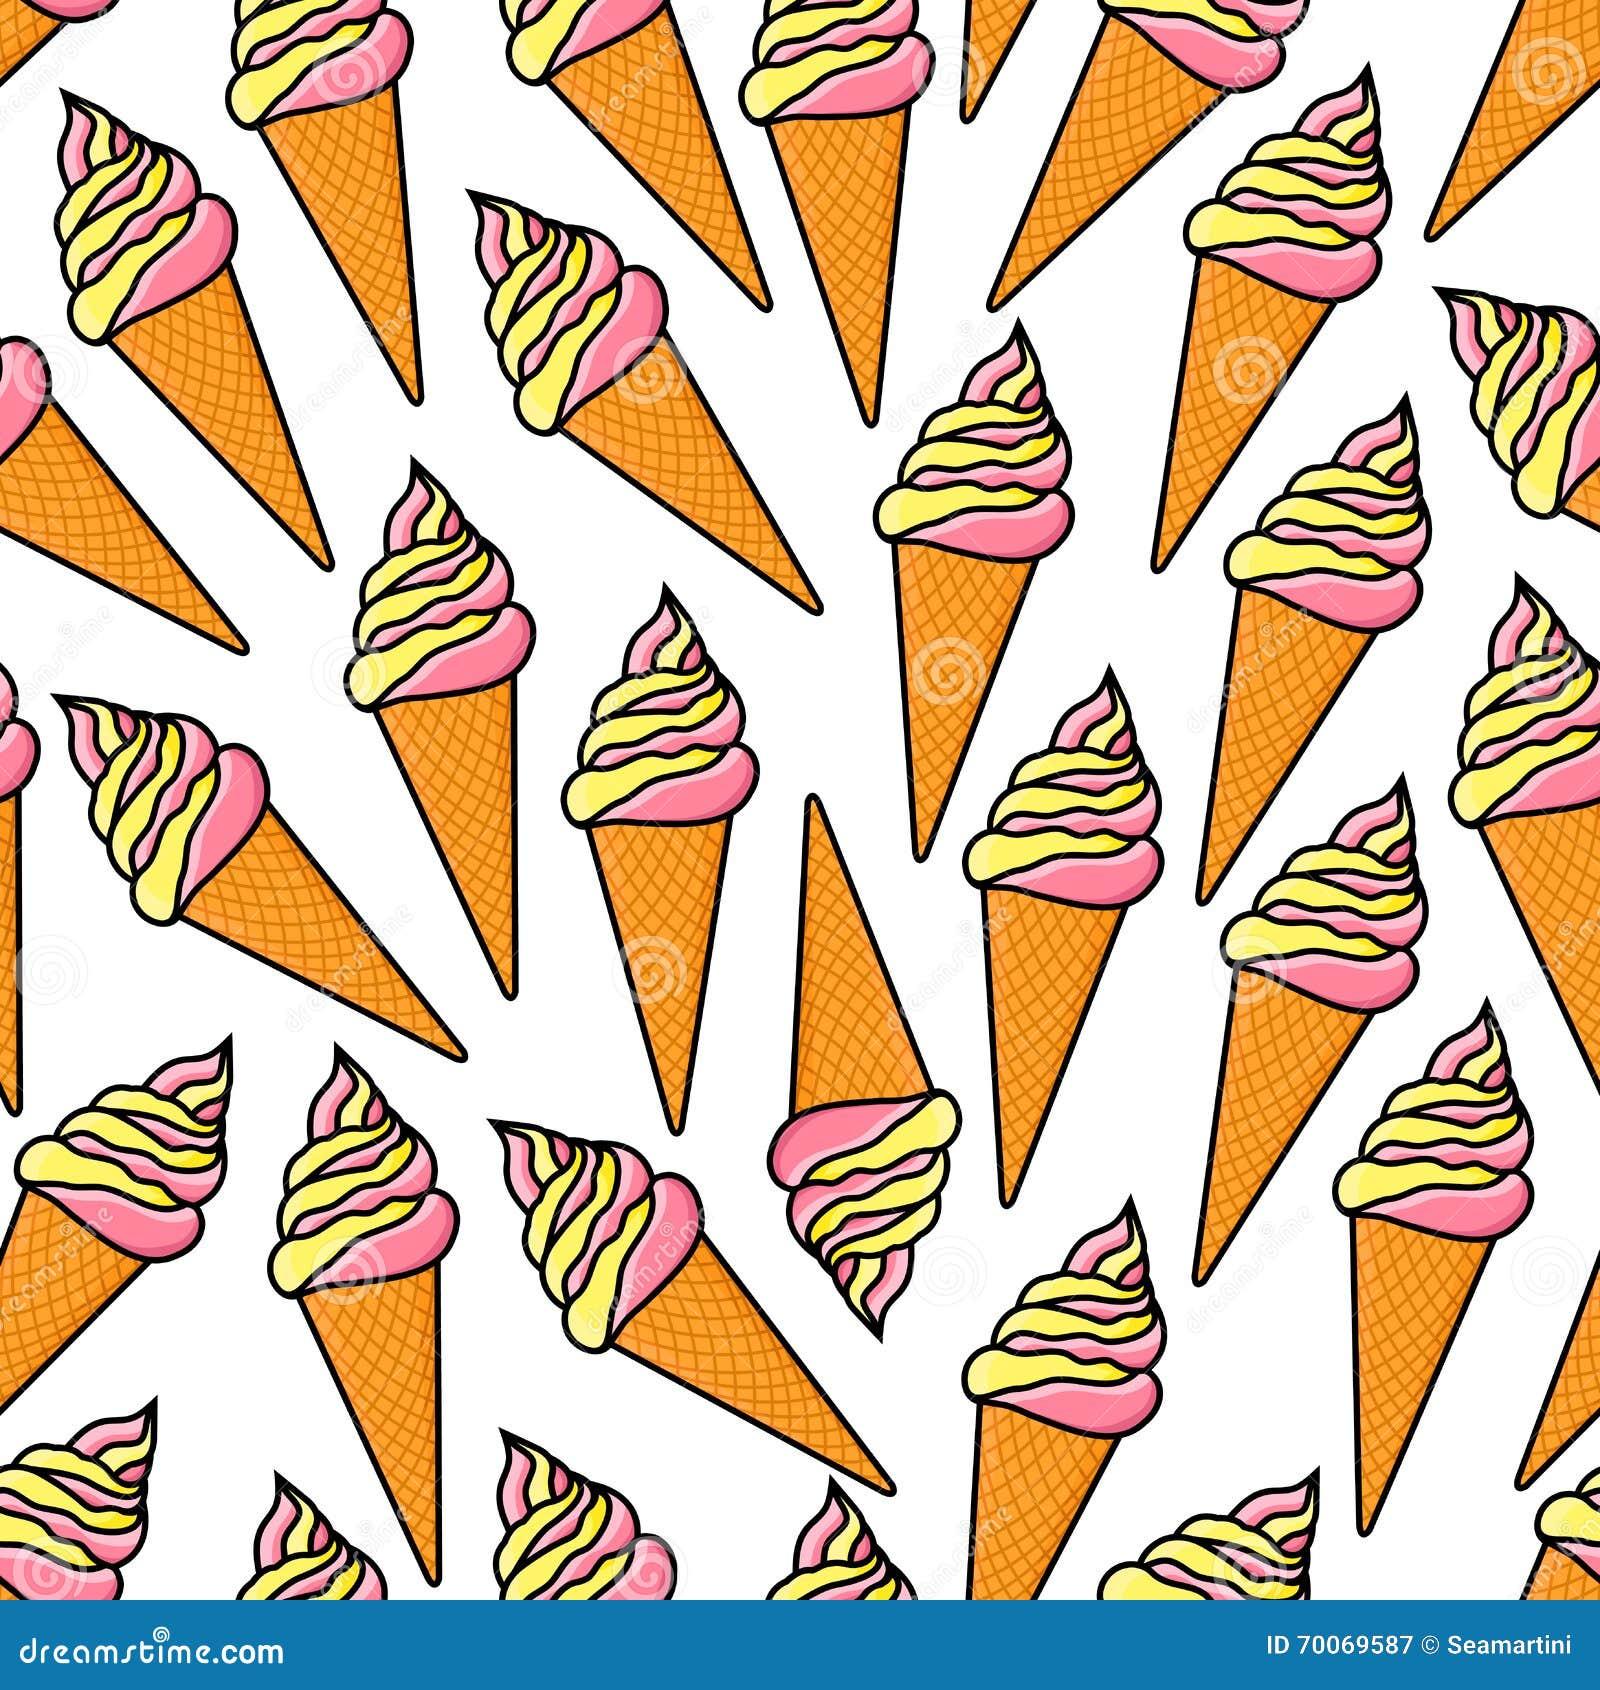 Seamless Ice Cream Background Vintage Style: Soft Serve Ice Cream Cones Retro Seamless Pattern Stock